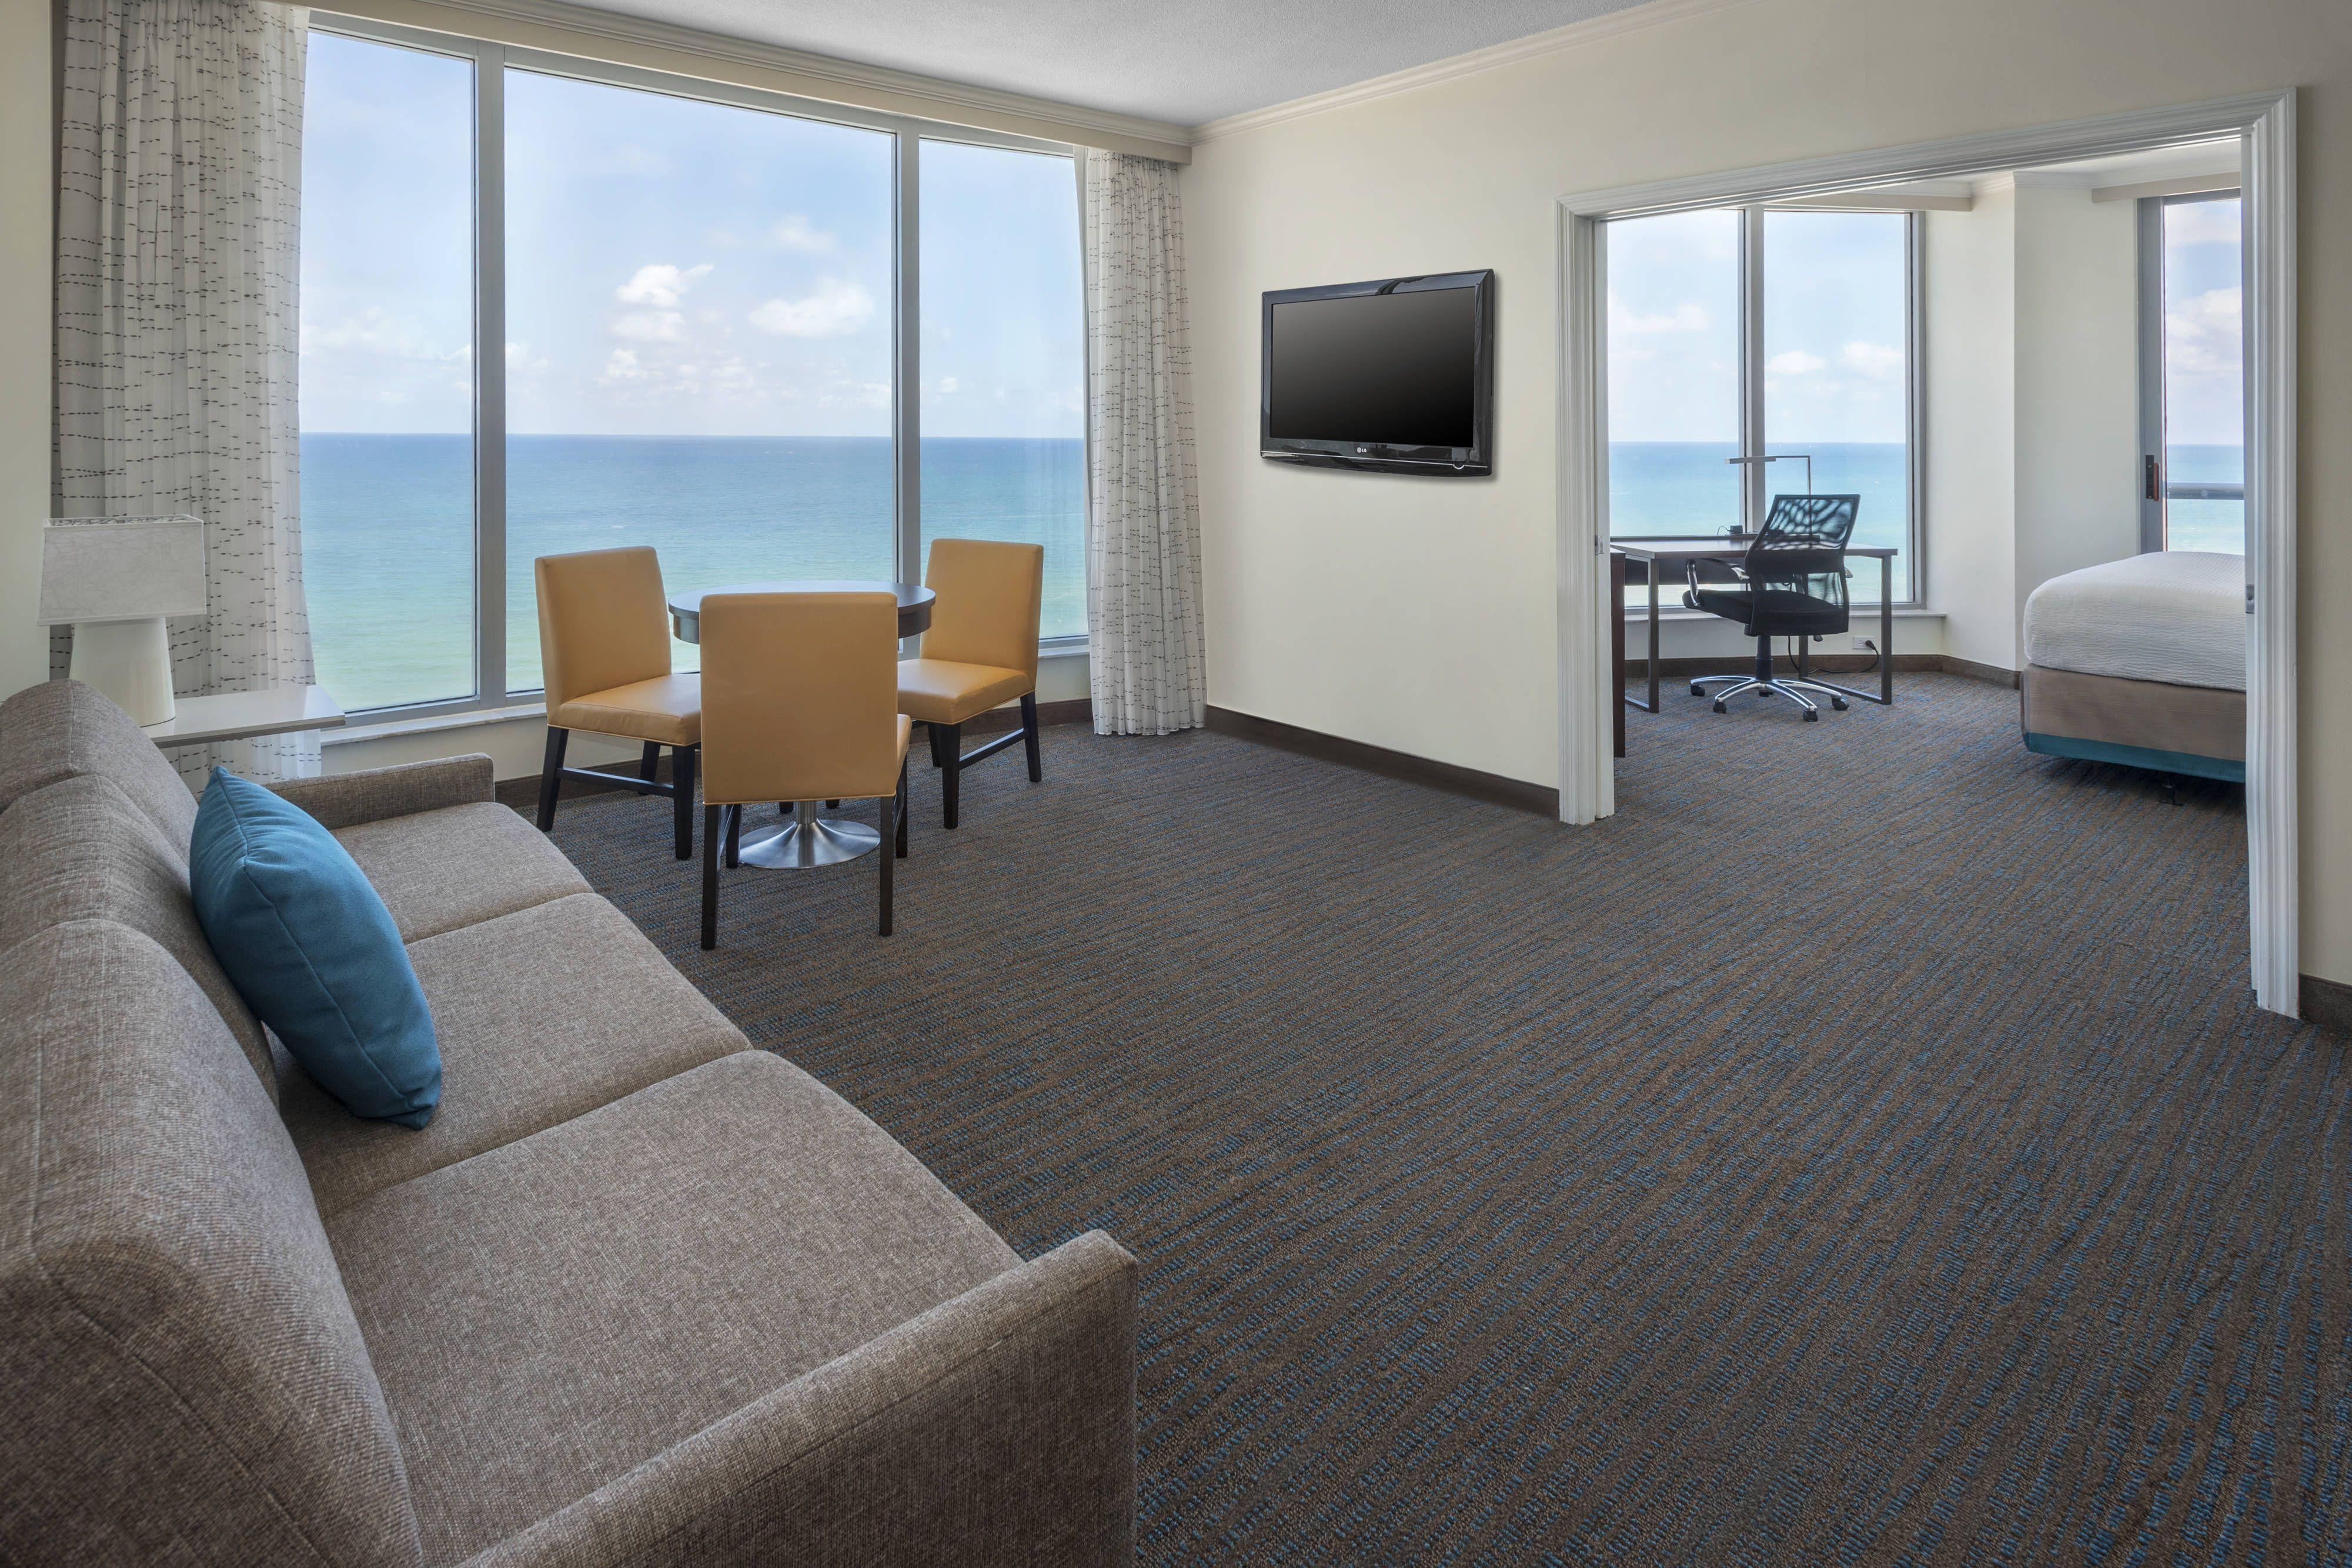 Residence Inn Fort Lauderdale Pompano Beach Oceanfront Two Bedroom Oceanfront Suite Living Room Memorable Holidays Florida Hotels Oceanfront Pompano Beach